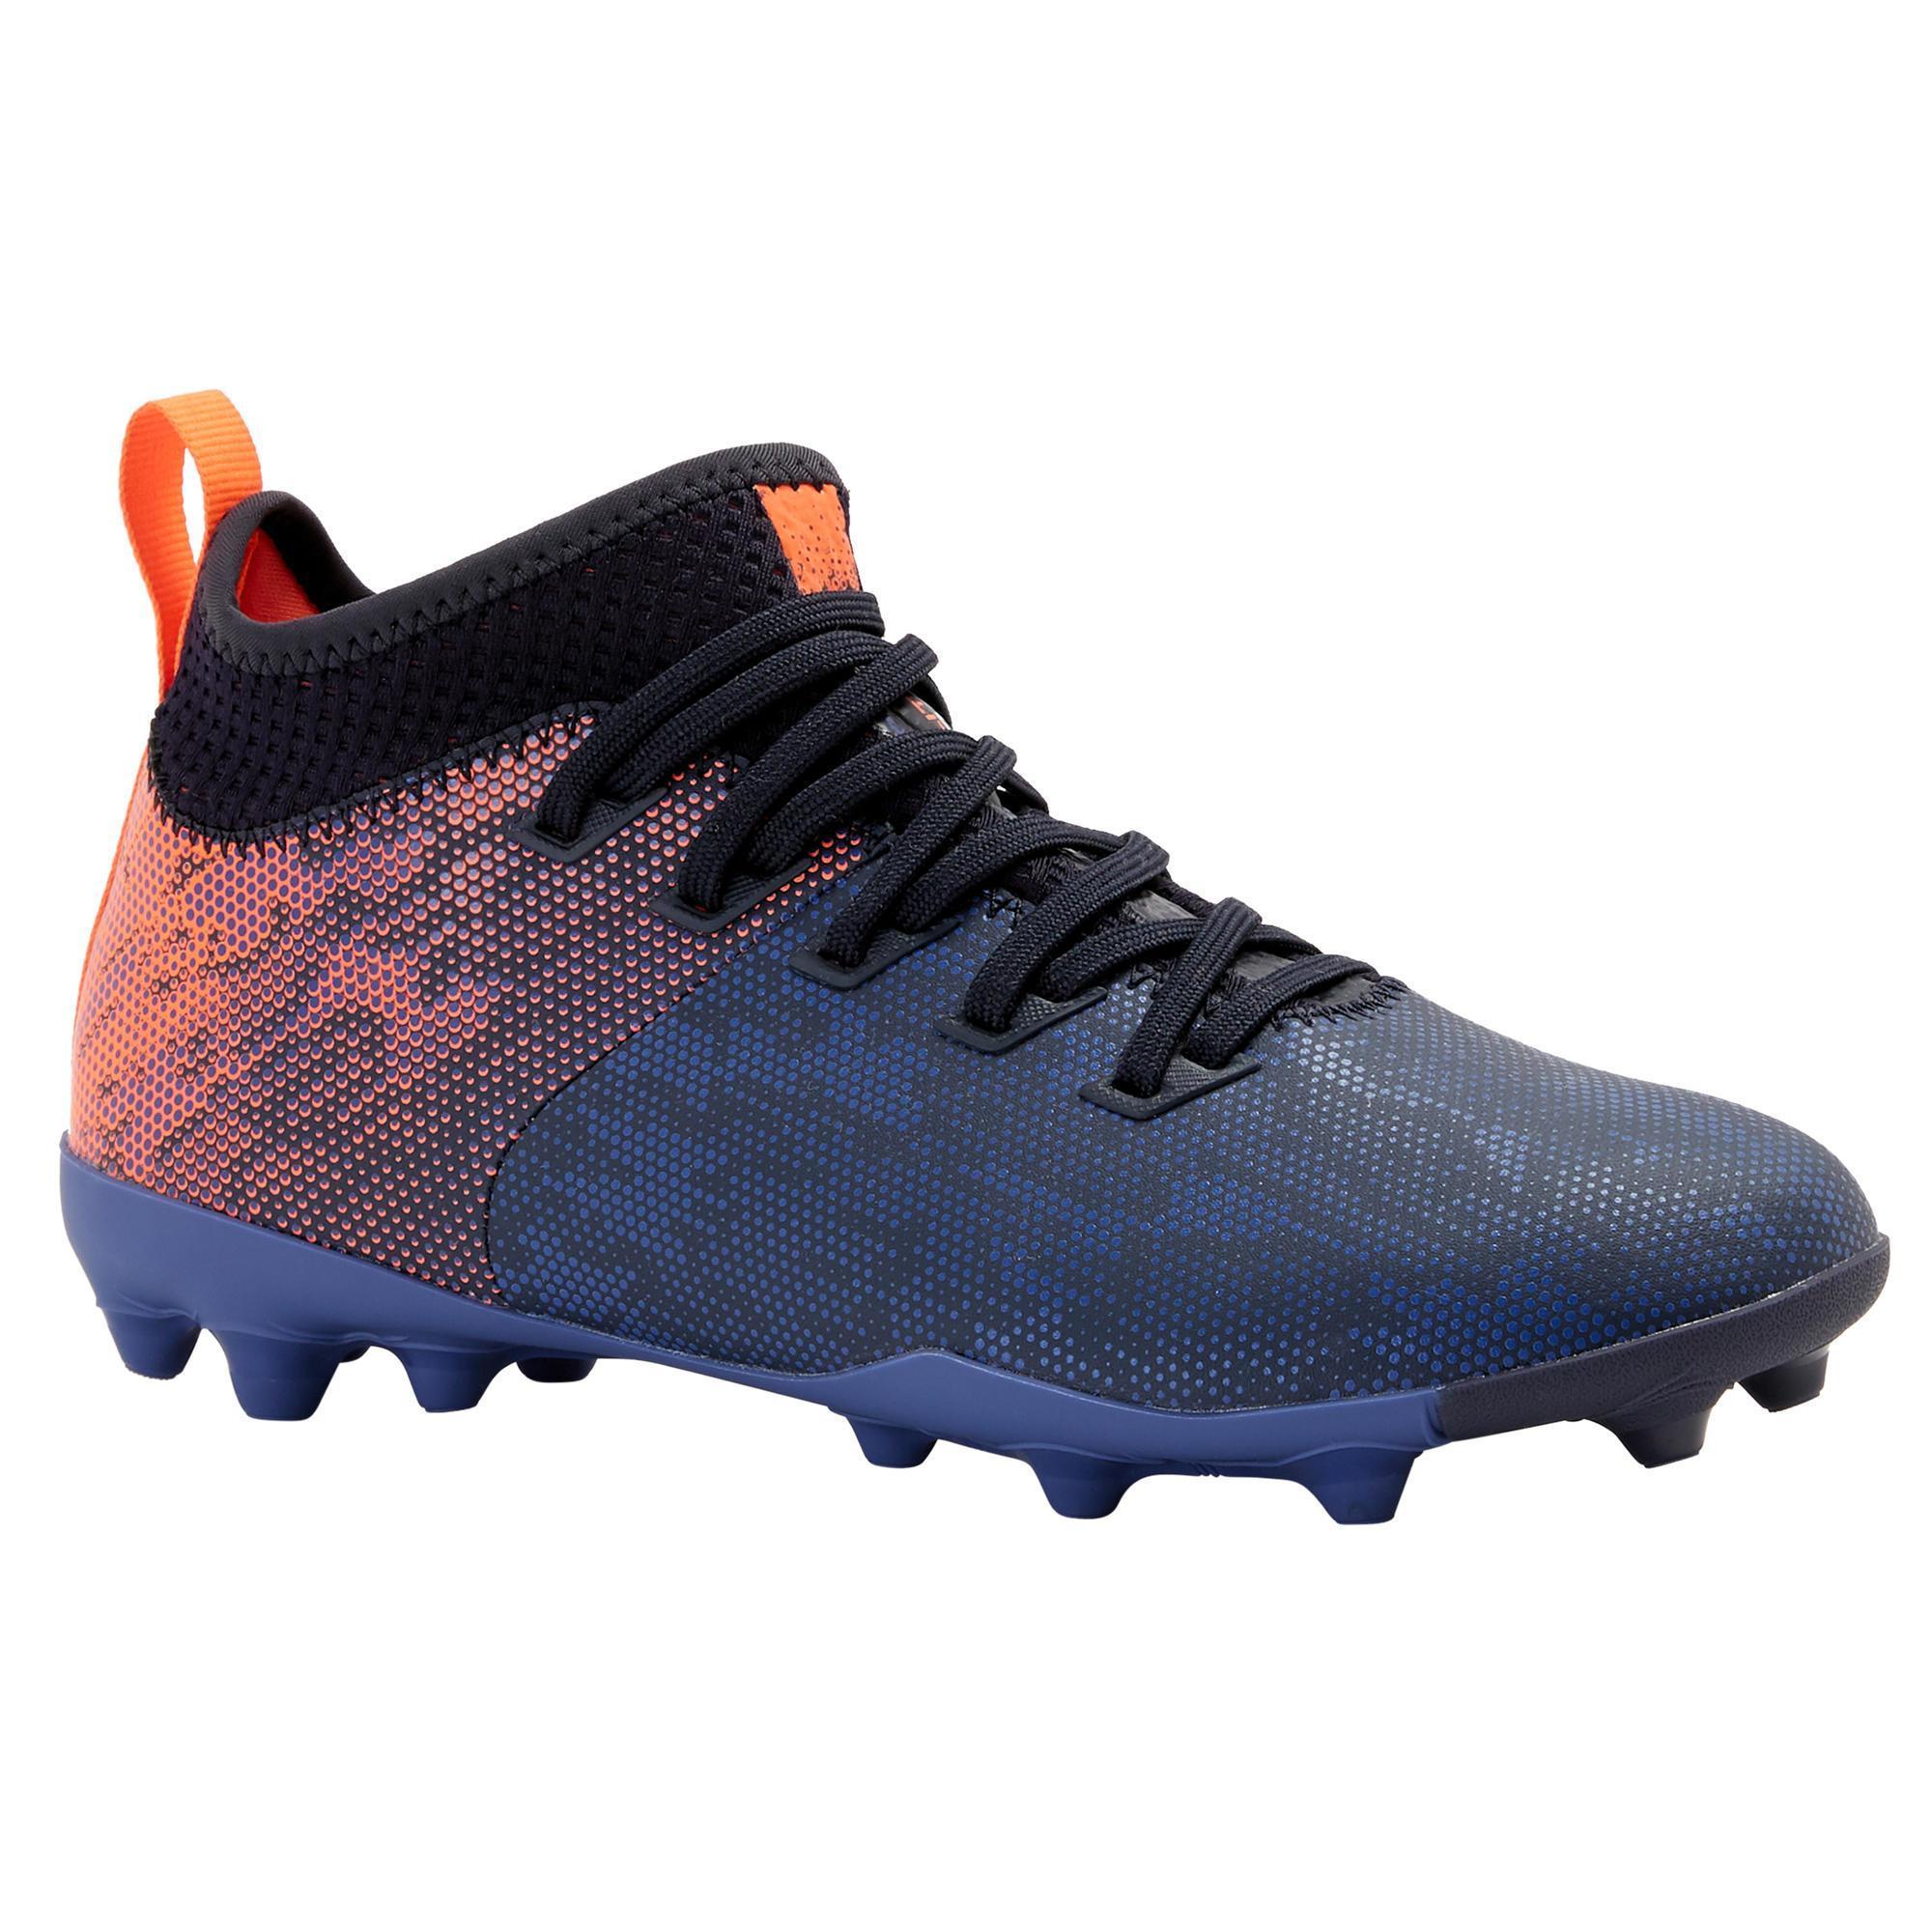 Football Shoes Hong Kong | Soccer Boots